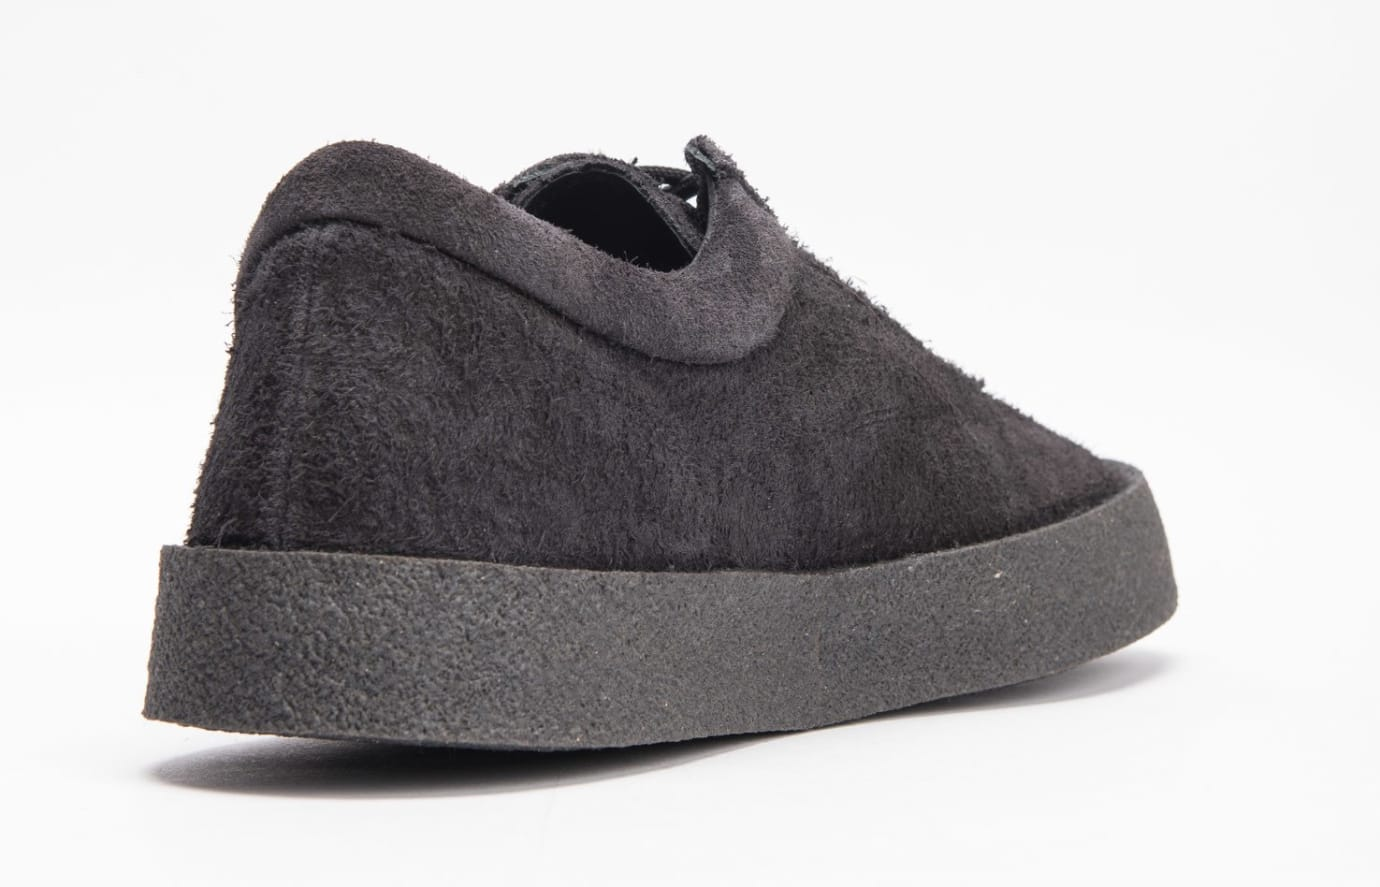 Yeezy Season 6 Crepe Sneaker Thick Shaggy Suede 'Black' KM5001-039 3